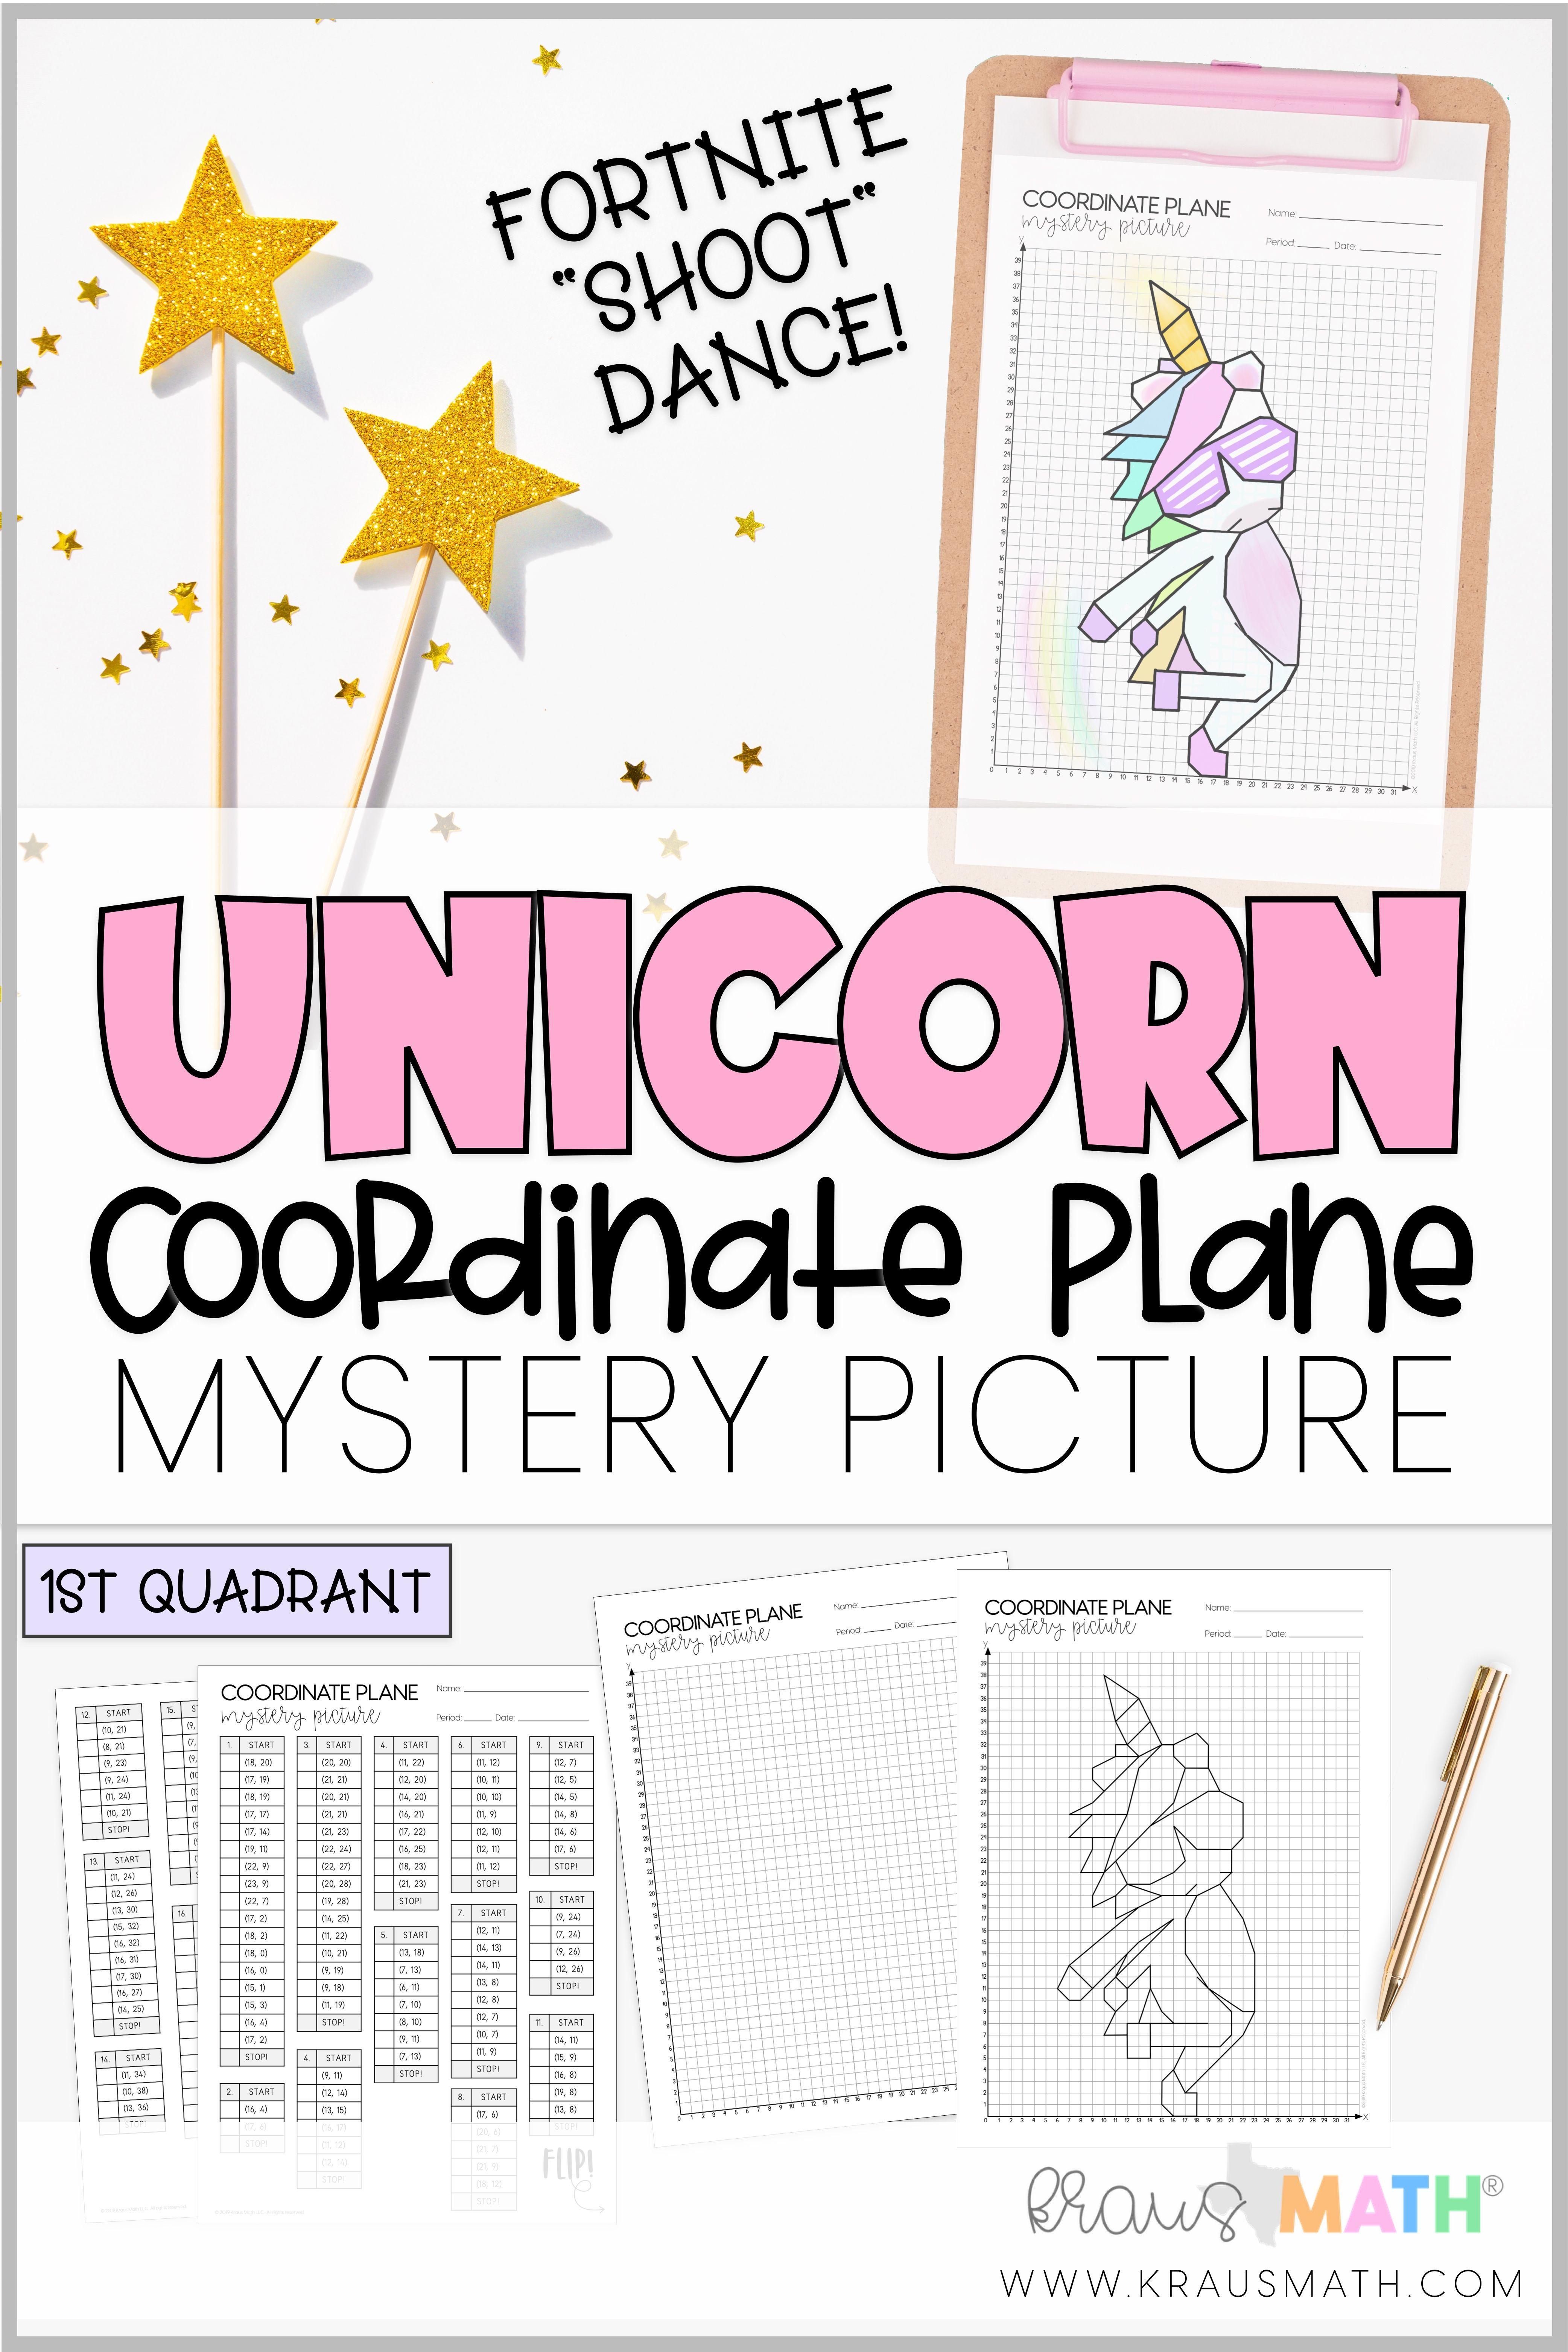 Unicorn Fortnite Shoot Dance Coordinate Plane Mystery